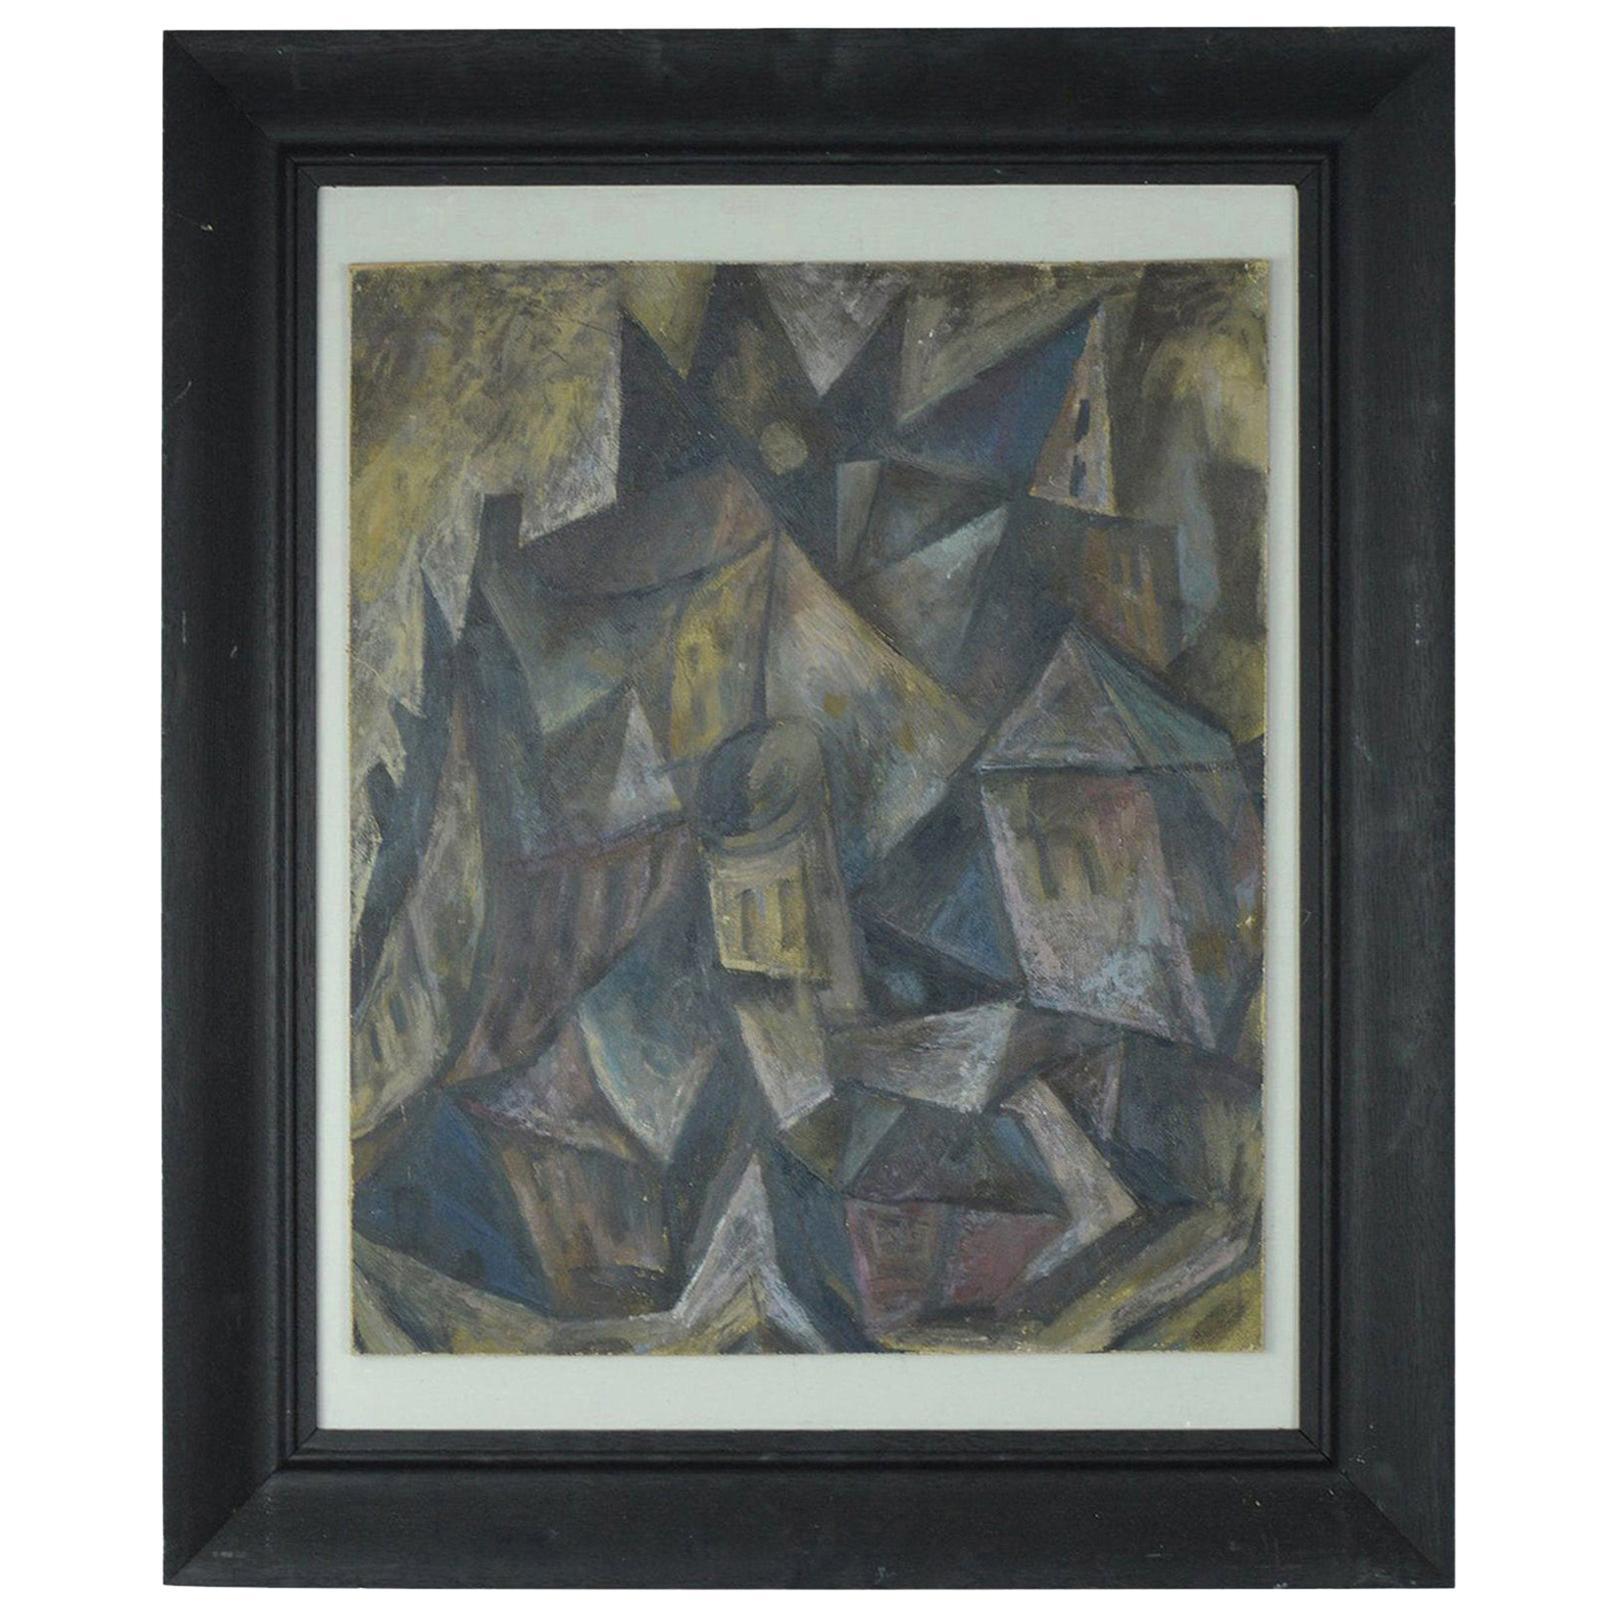 Abstract Landscape, David Lord, circa 1960